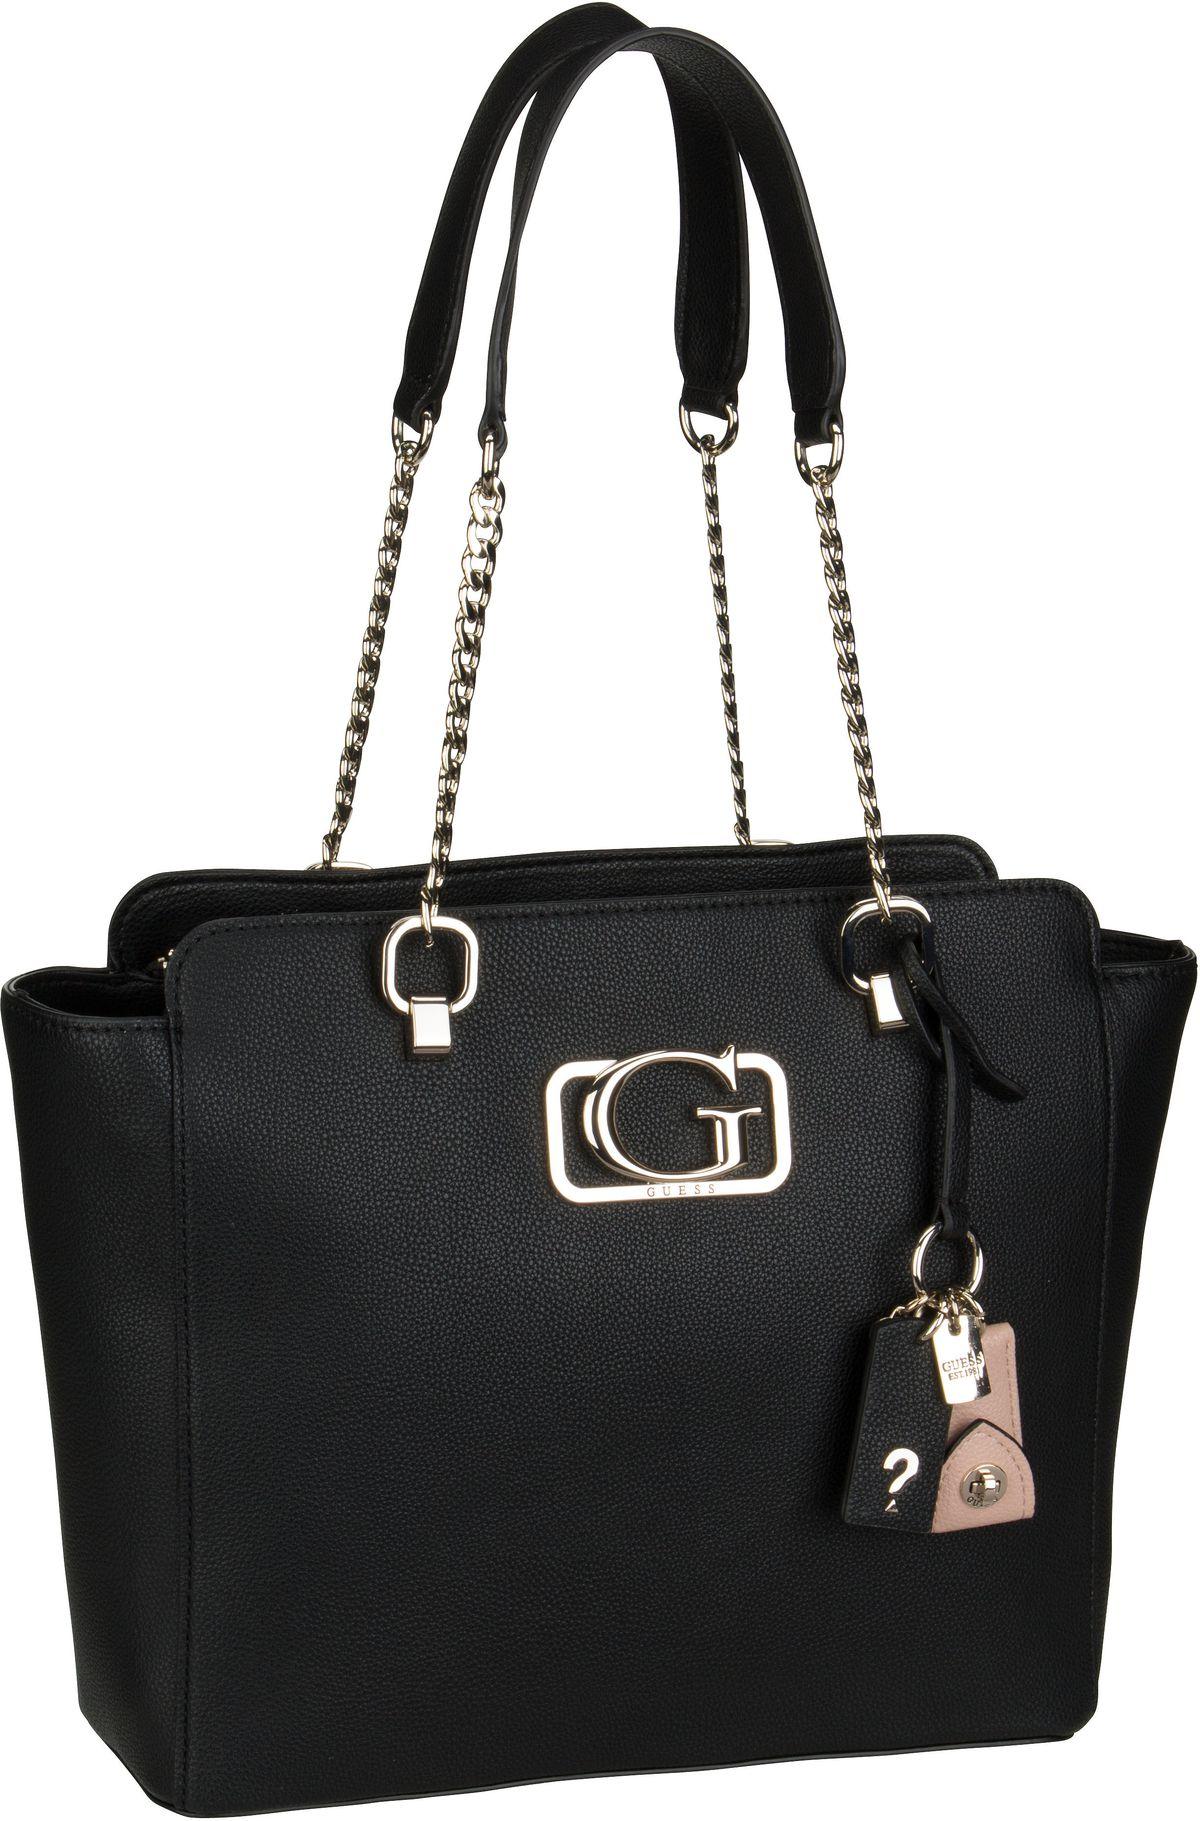 Handtasche Annarita Status Carryall Black